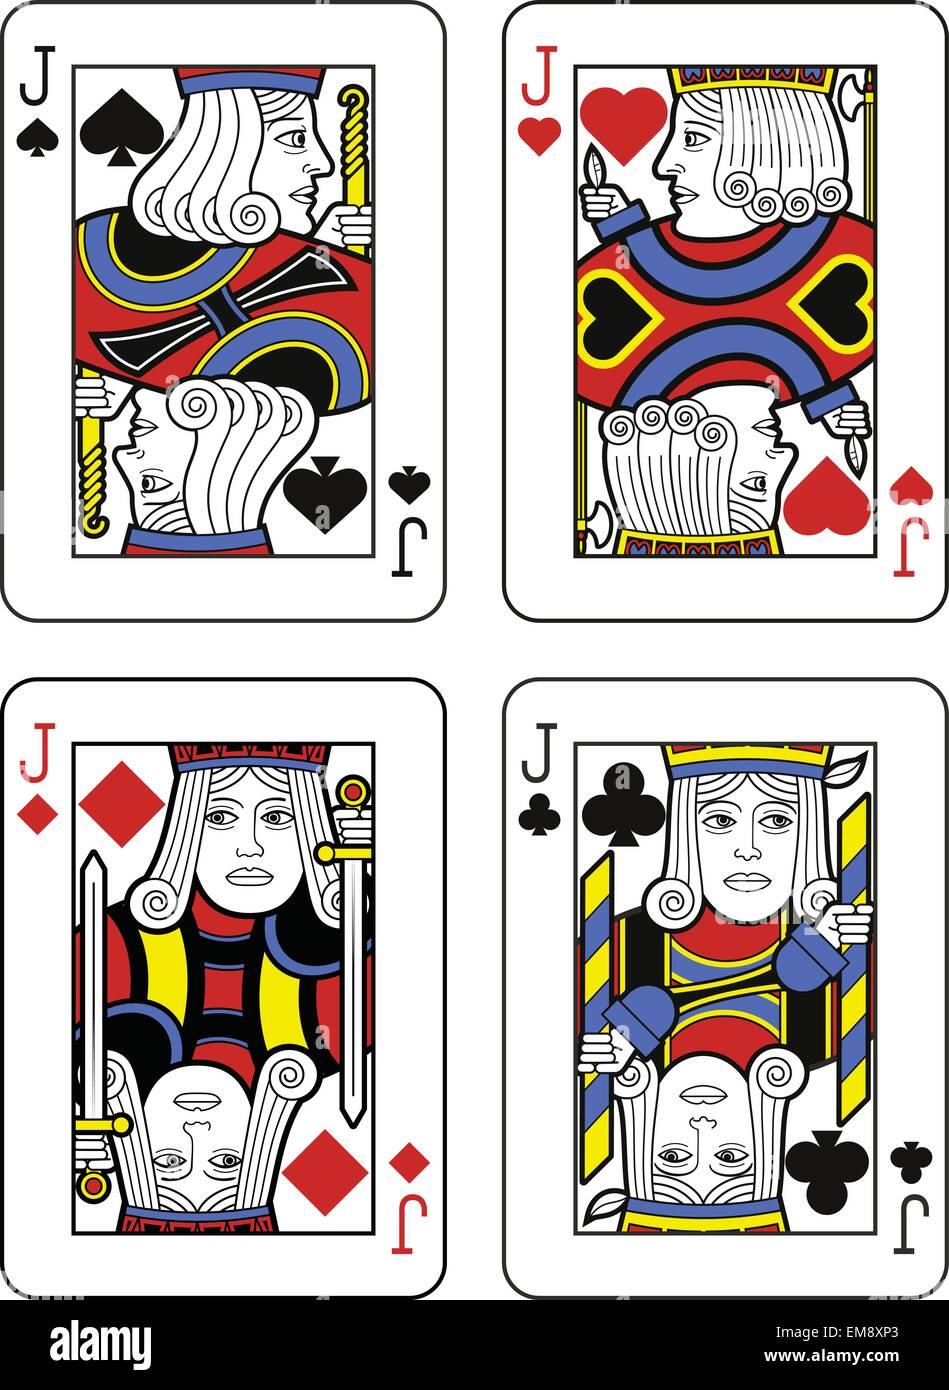 Quatre valets. Design original Photo Stock